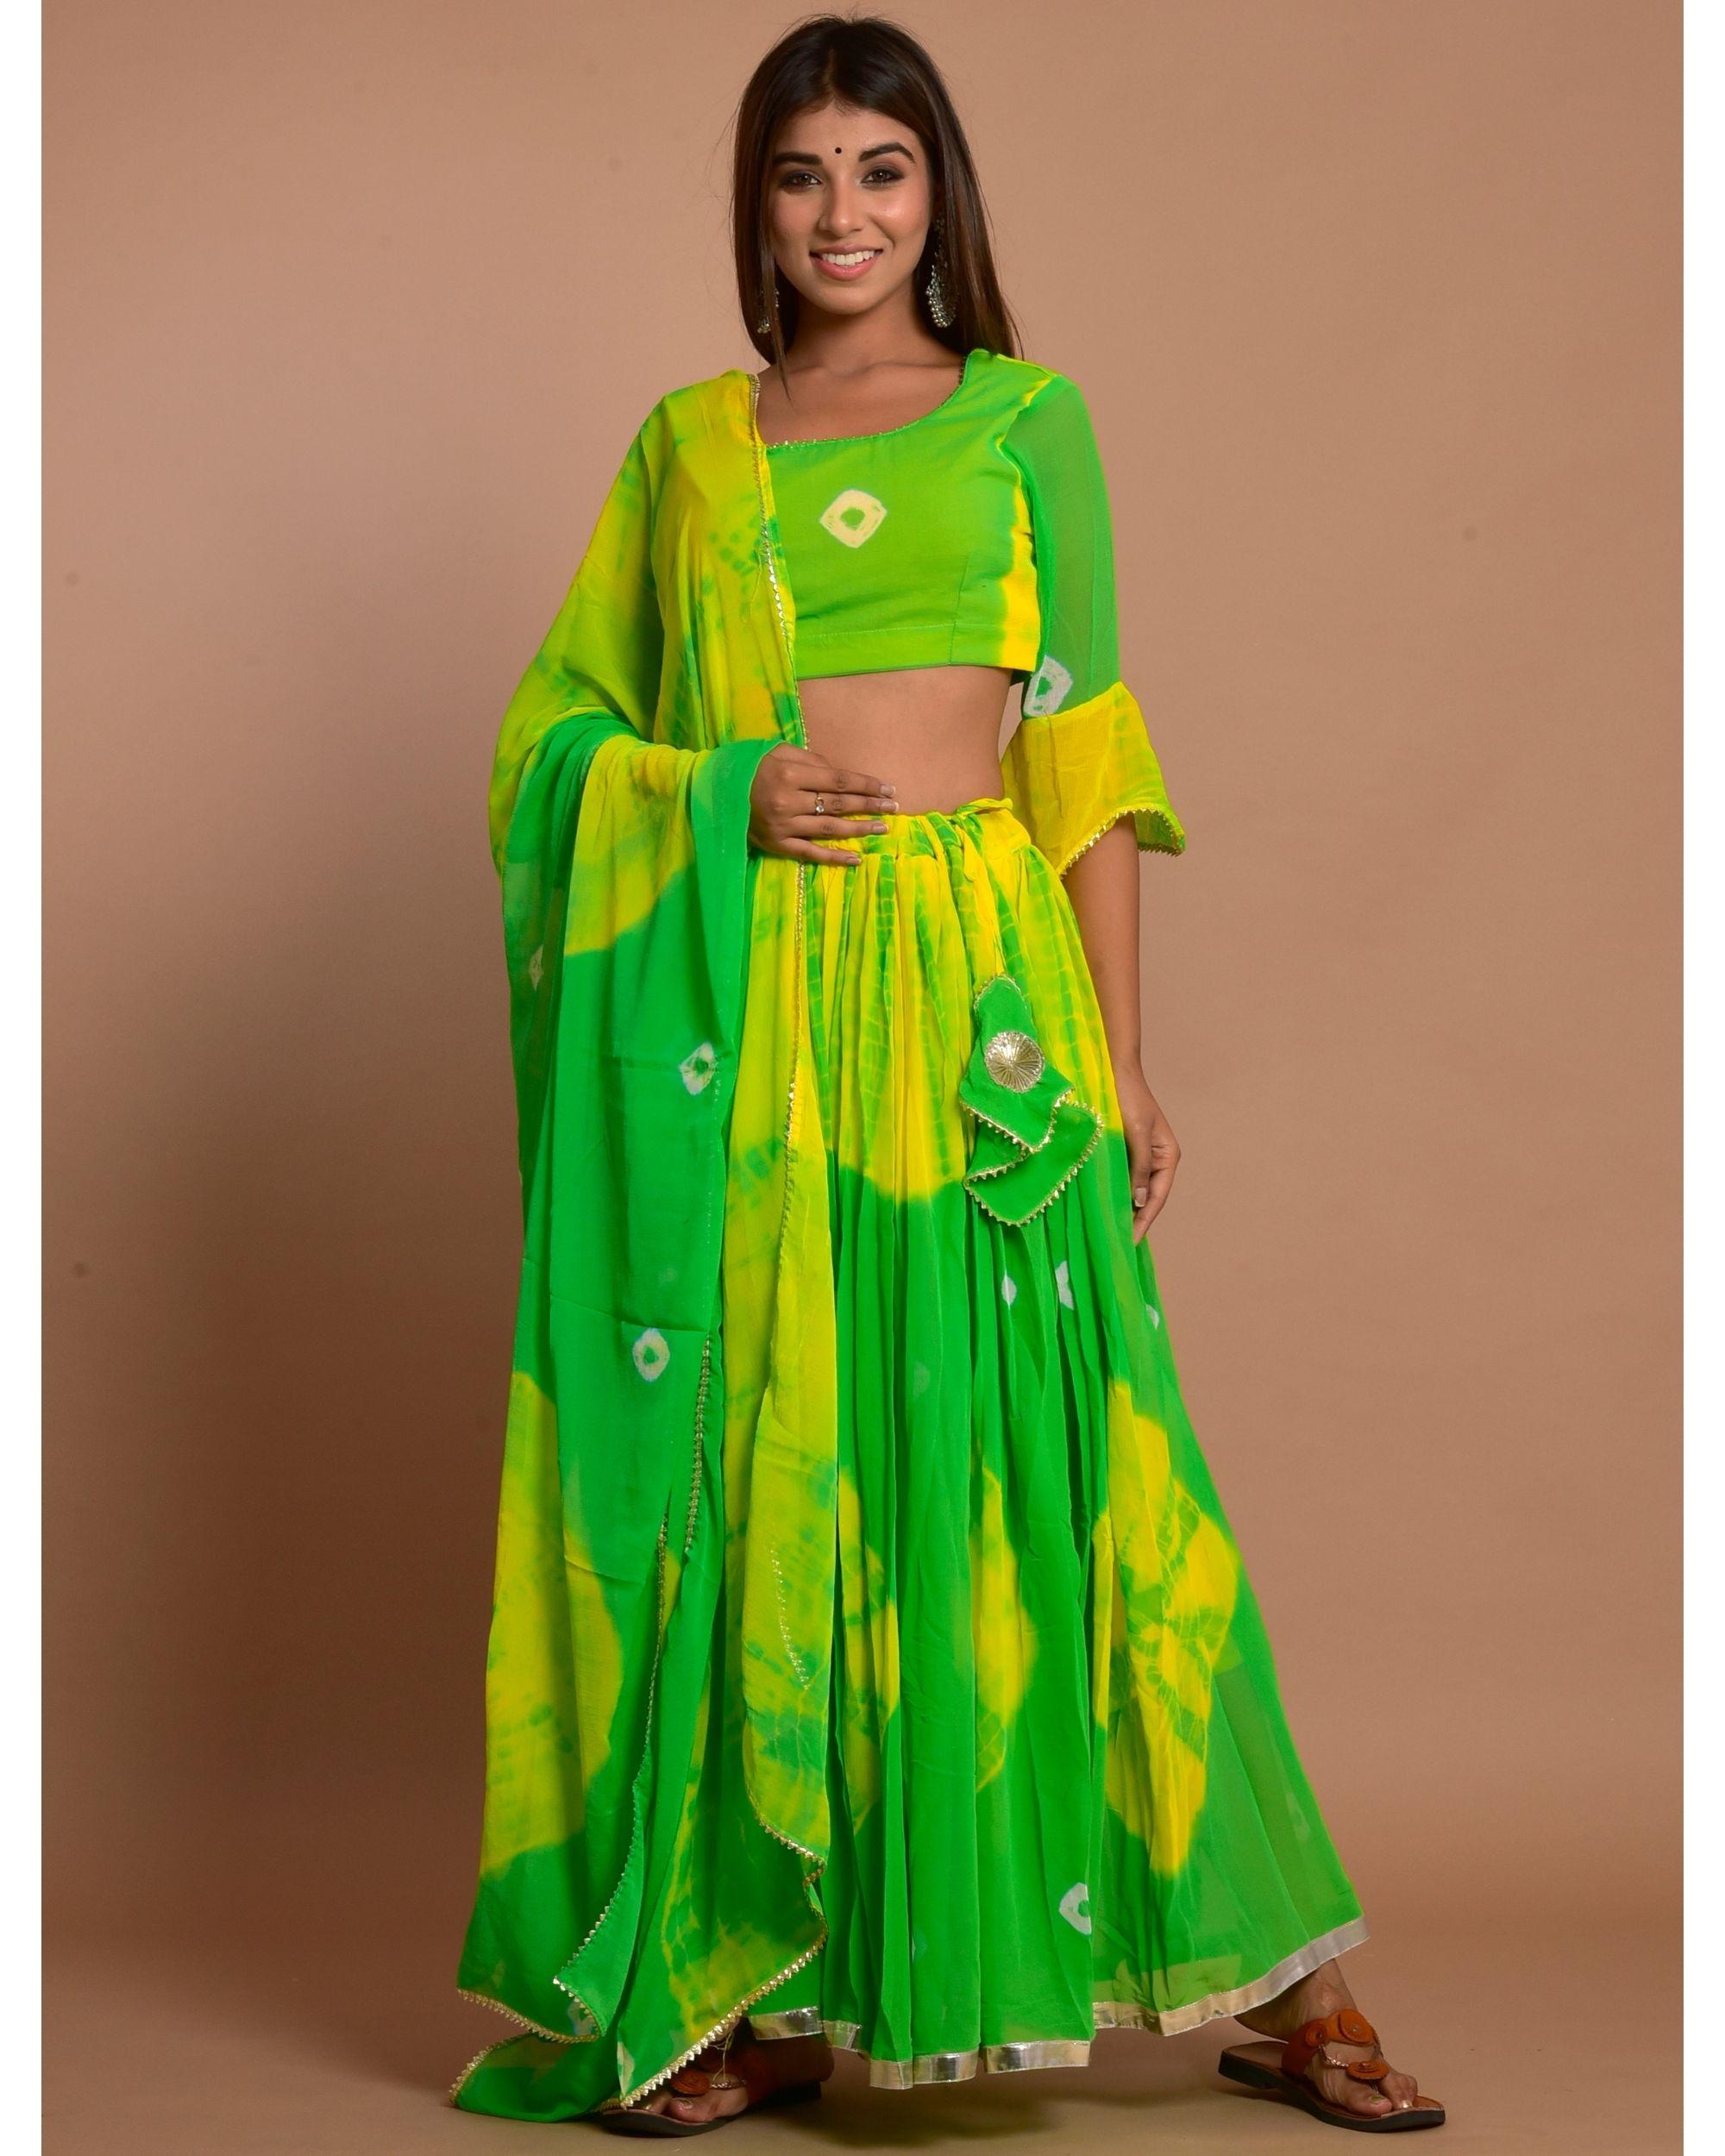 Green and yellow tie and dye choli and lehenga with dupatta - Set Of Three